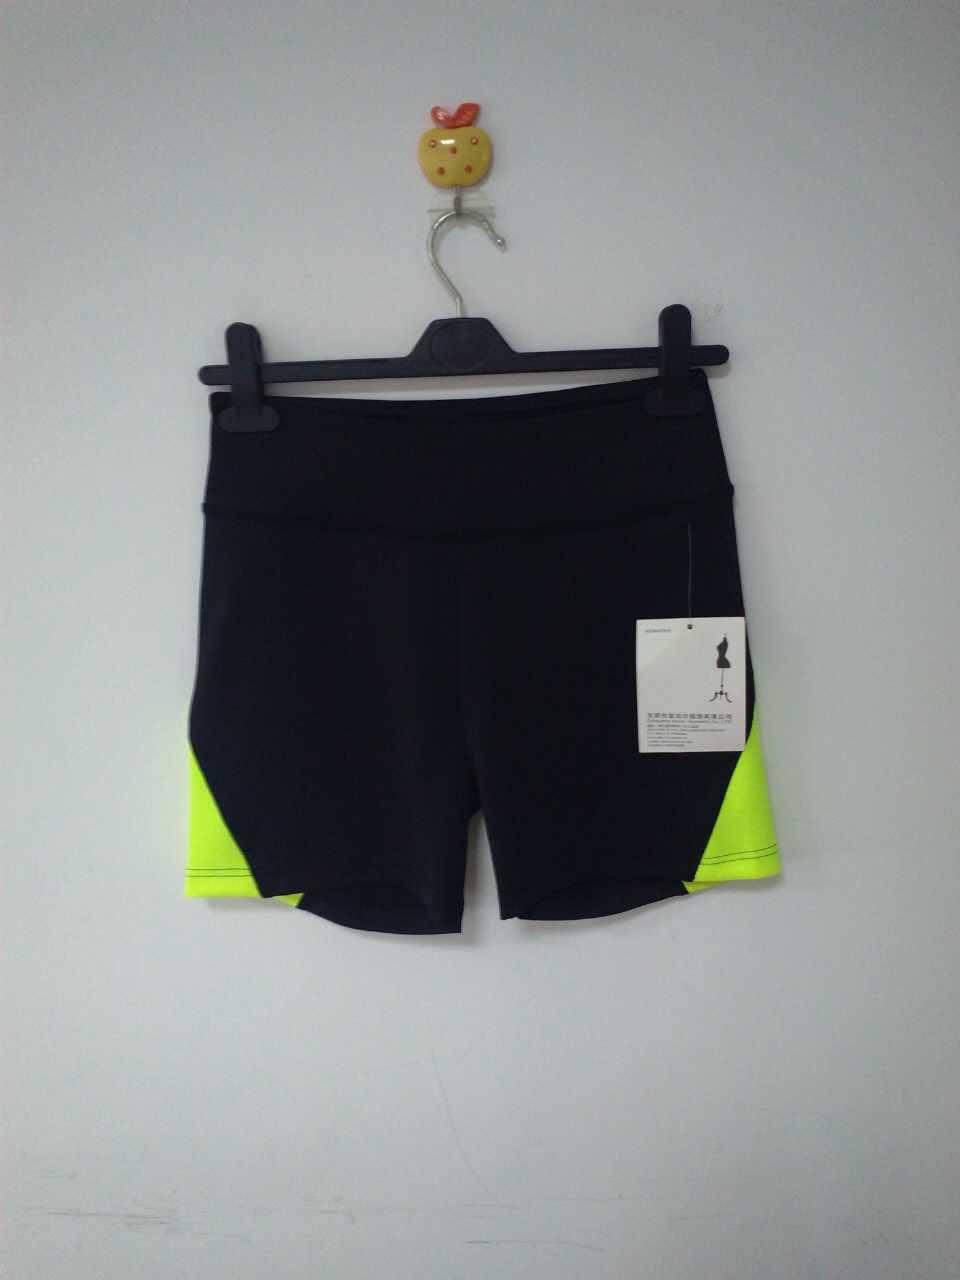 2015 Hot selling yoga short pants for women